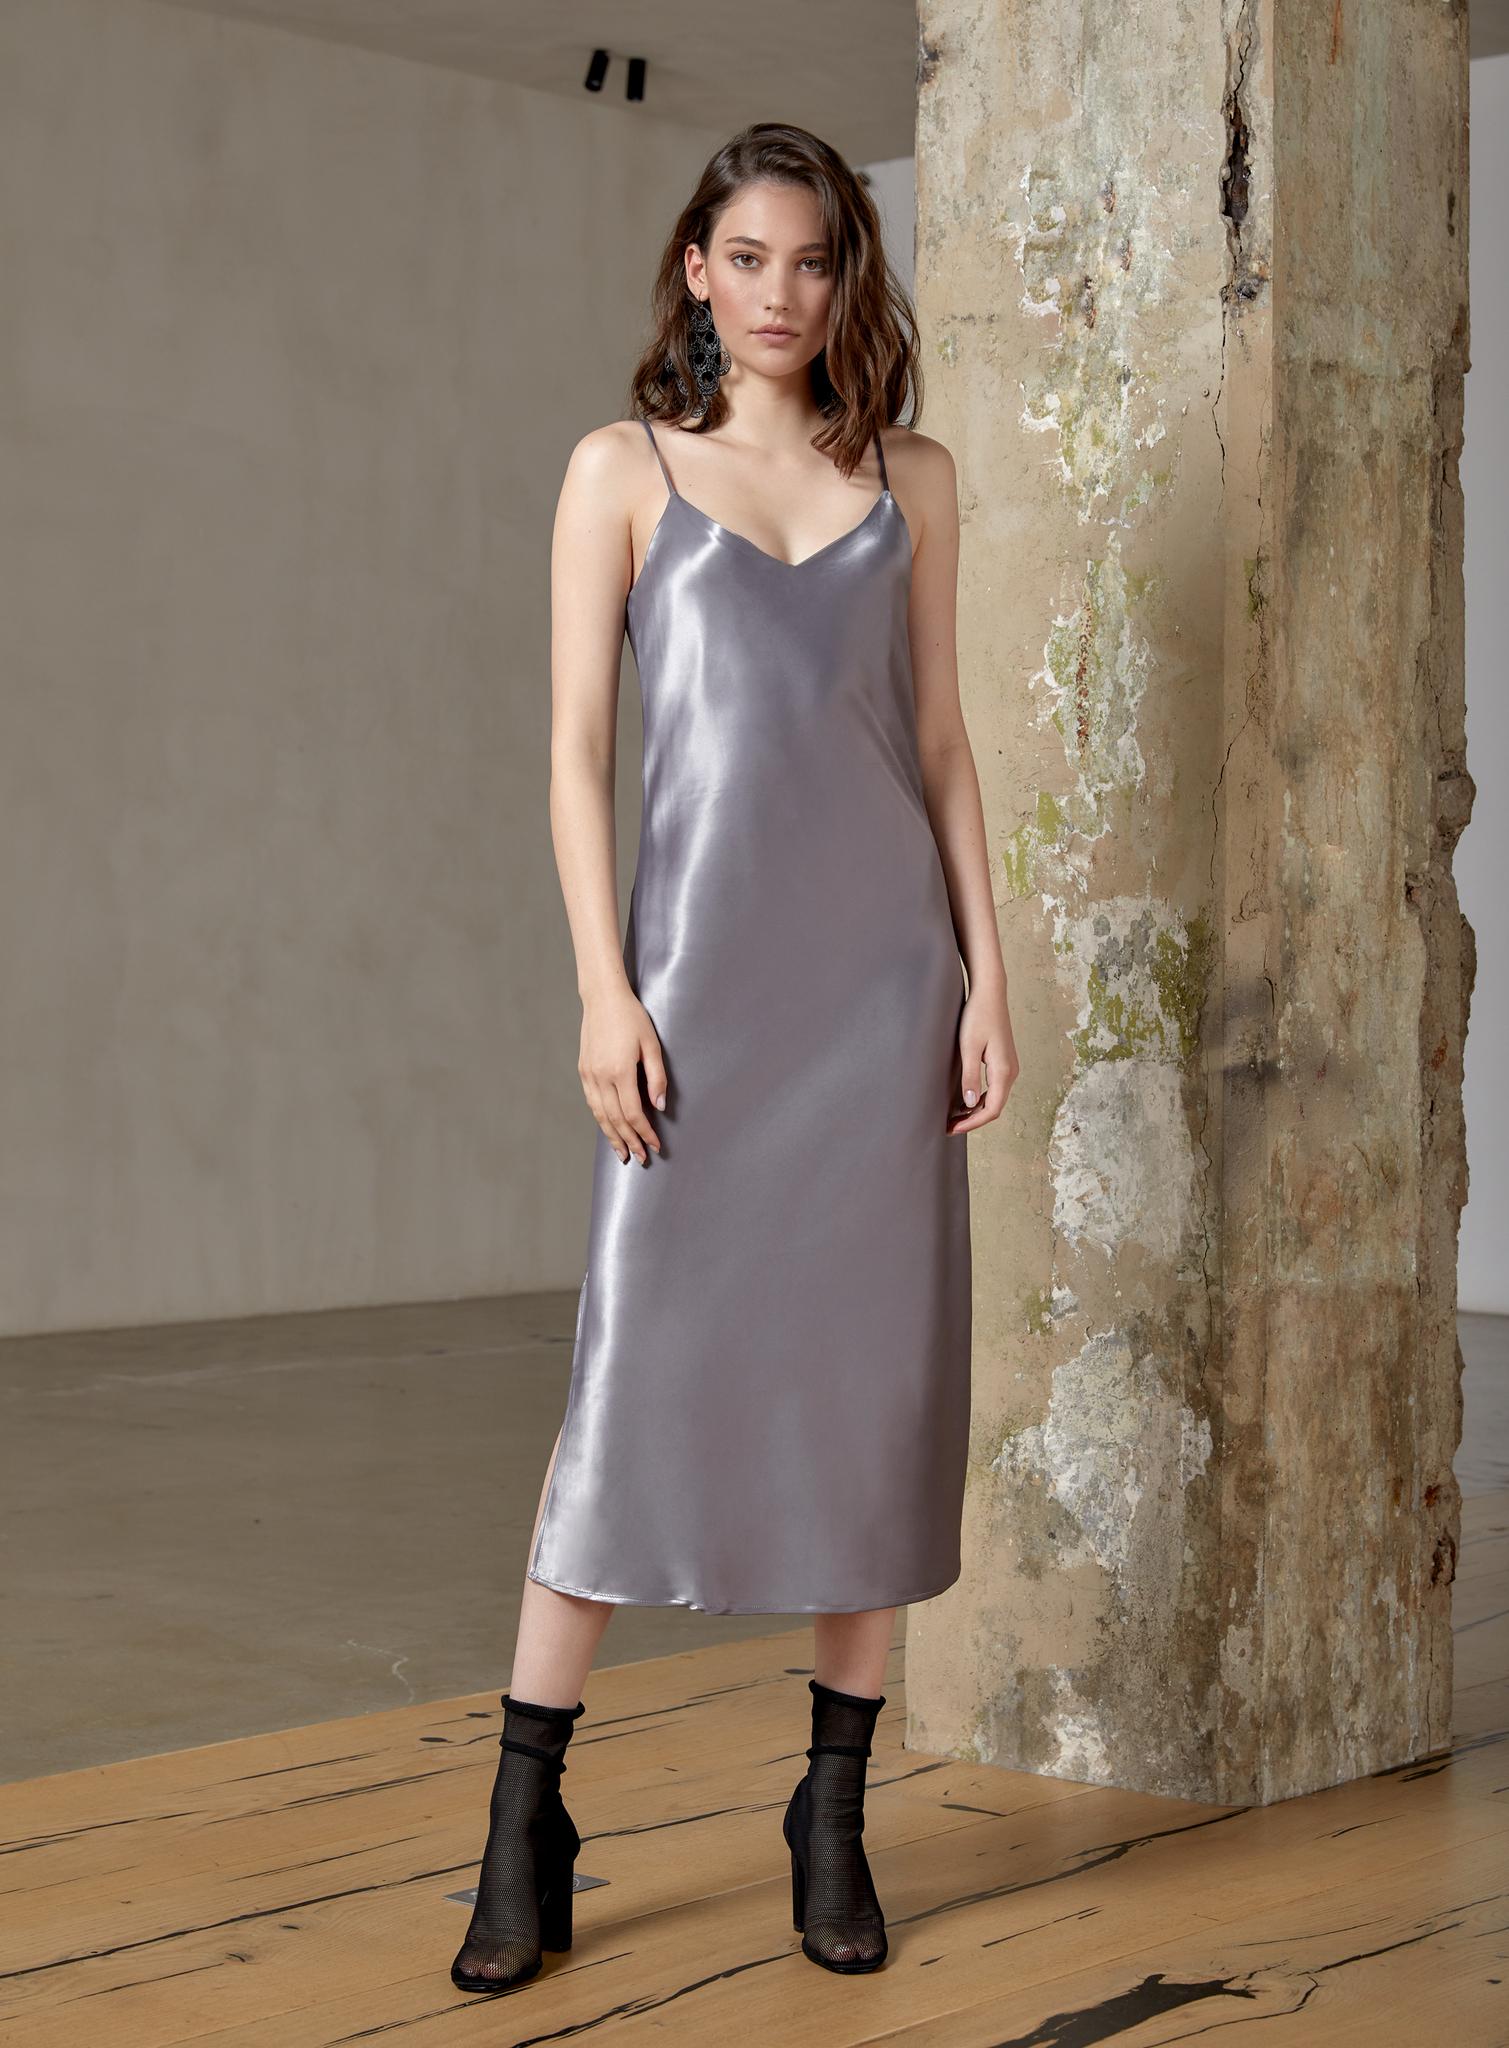 Платья Платье-комбинация hassfashion 20-1217 hassfashion-aw-20-211053.jpg